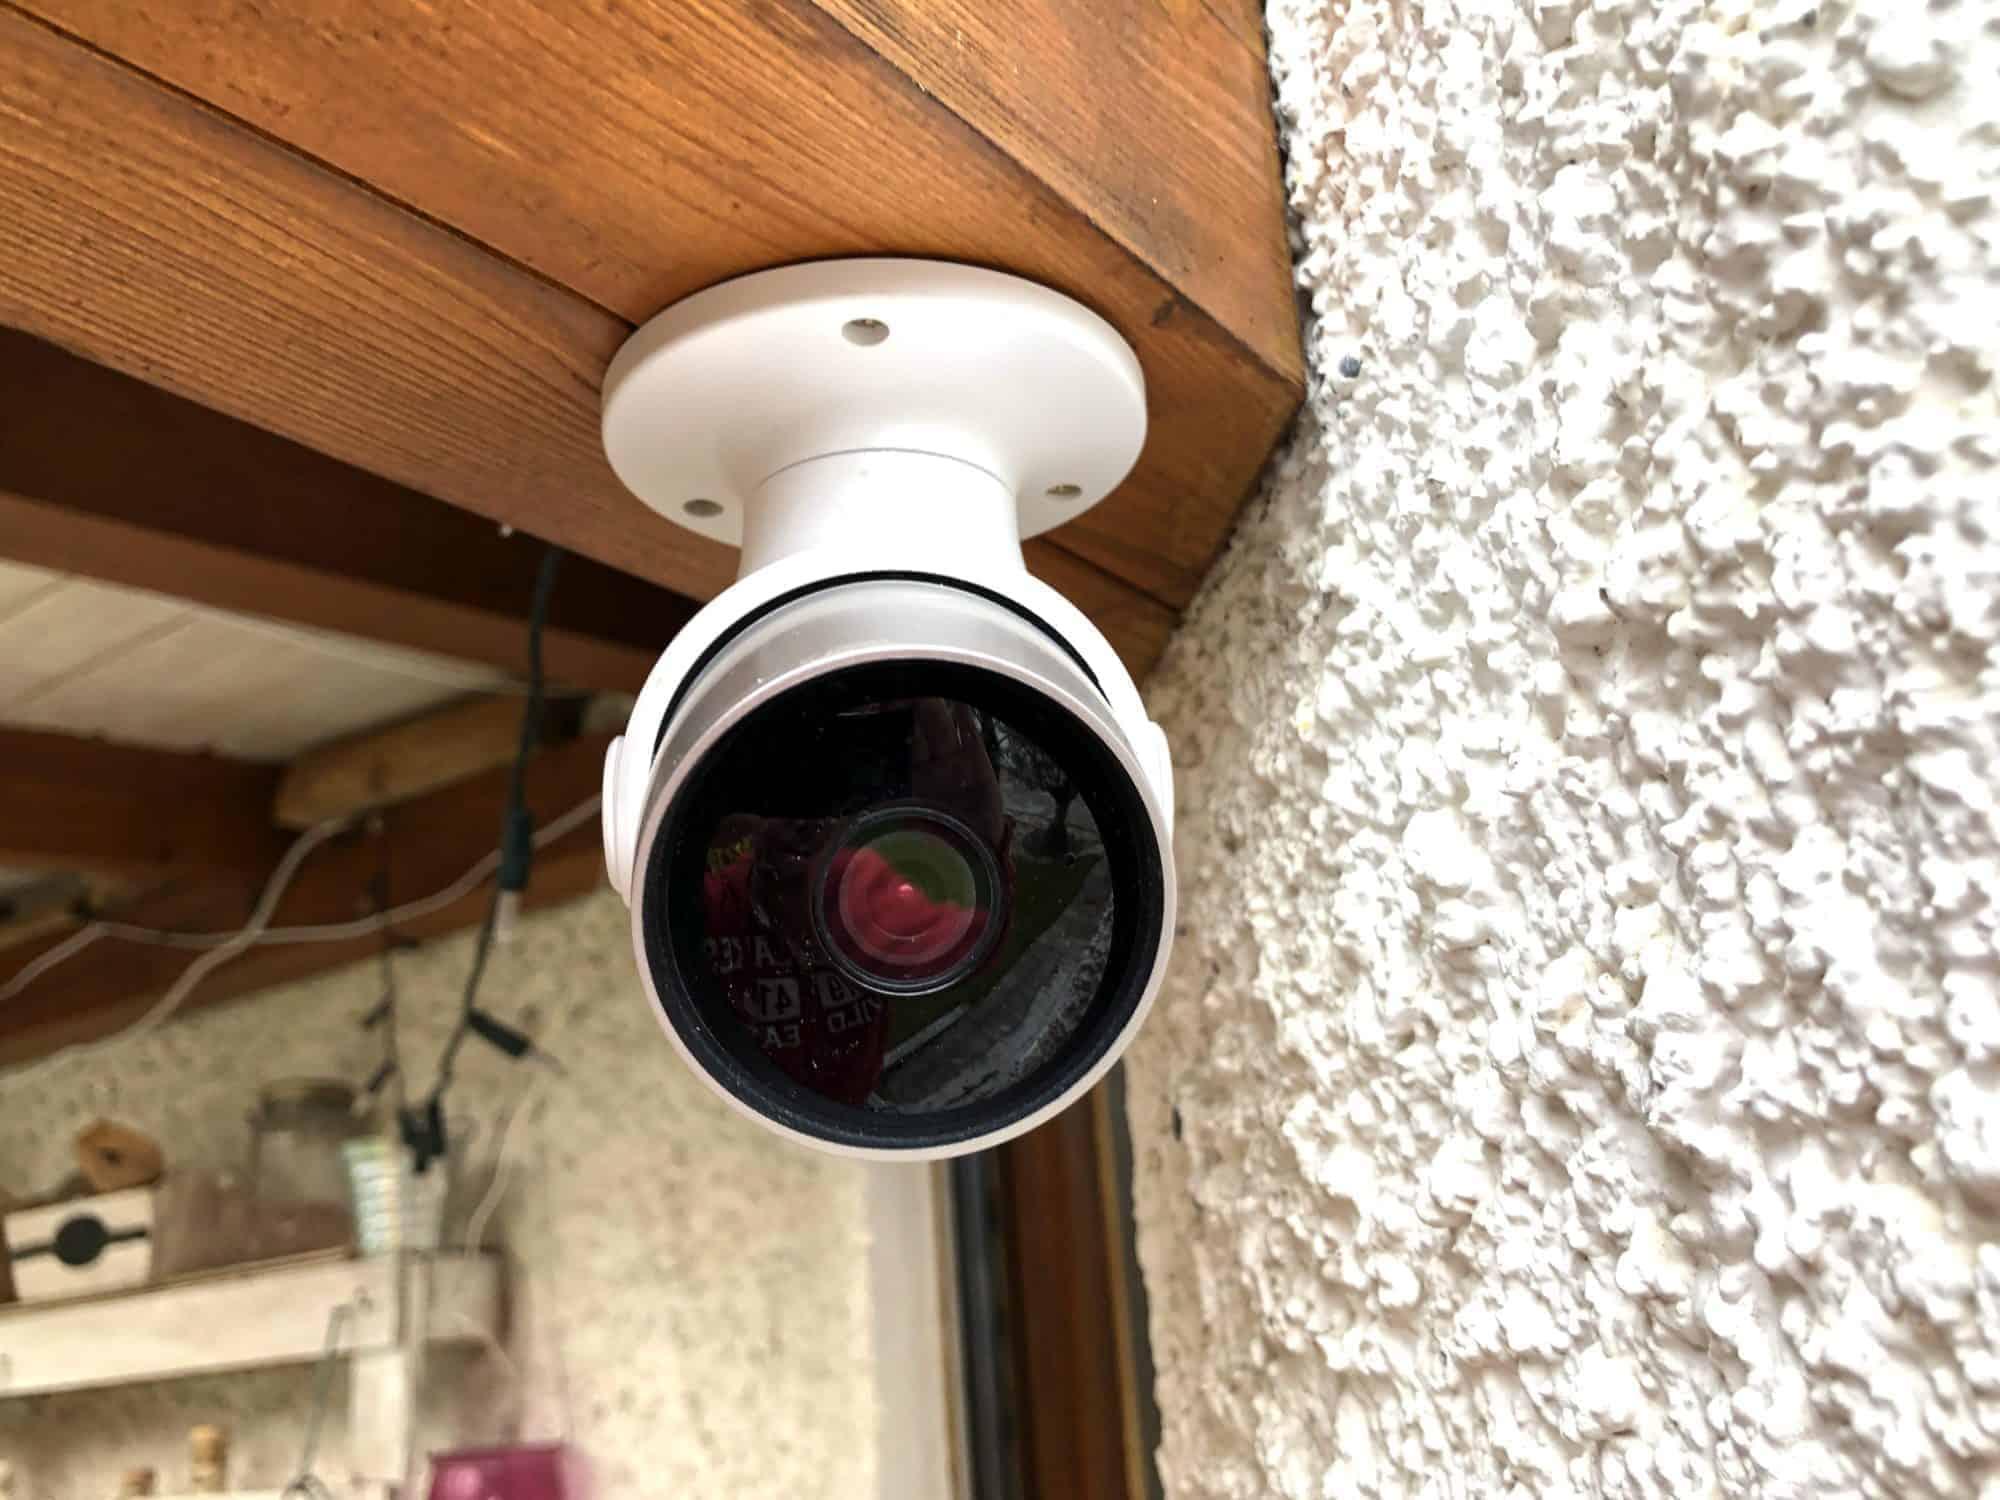 Praxistest im Garten: 1080P Aussenkamera (Panamalar) 1